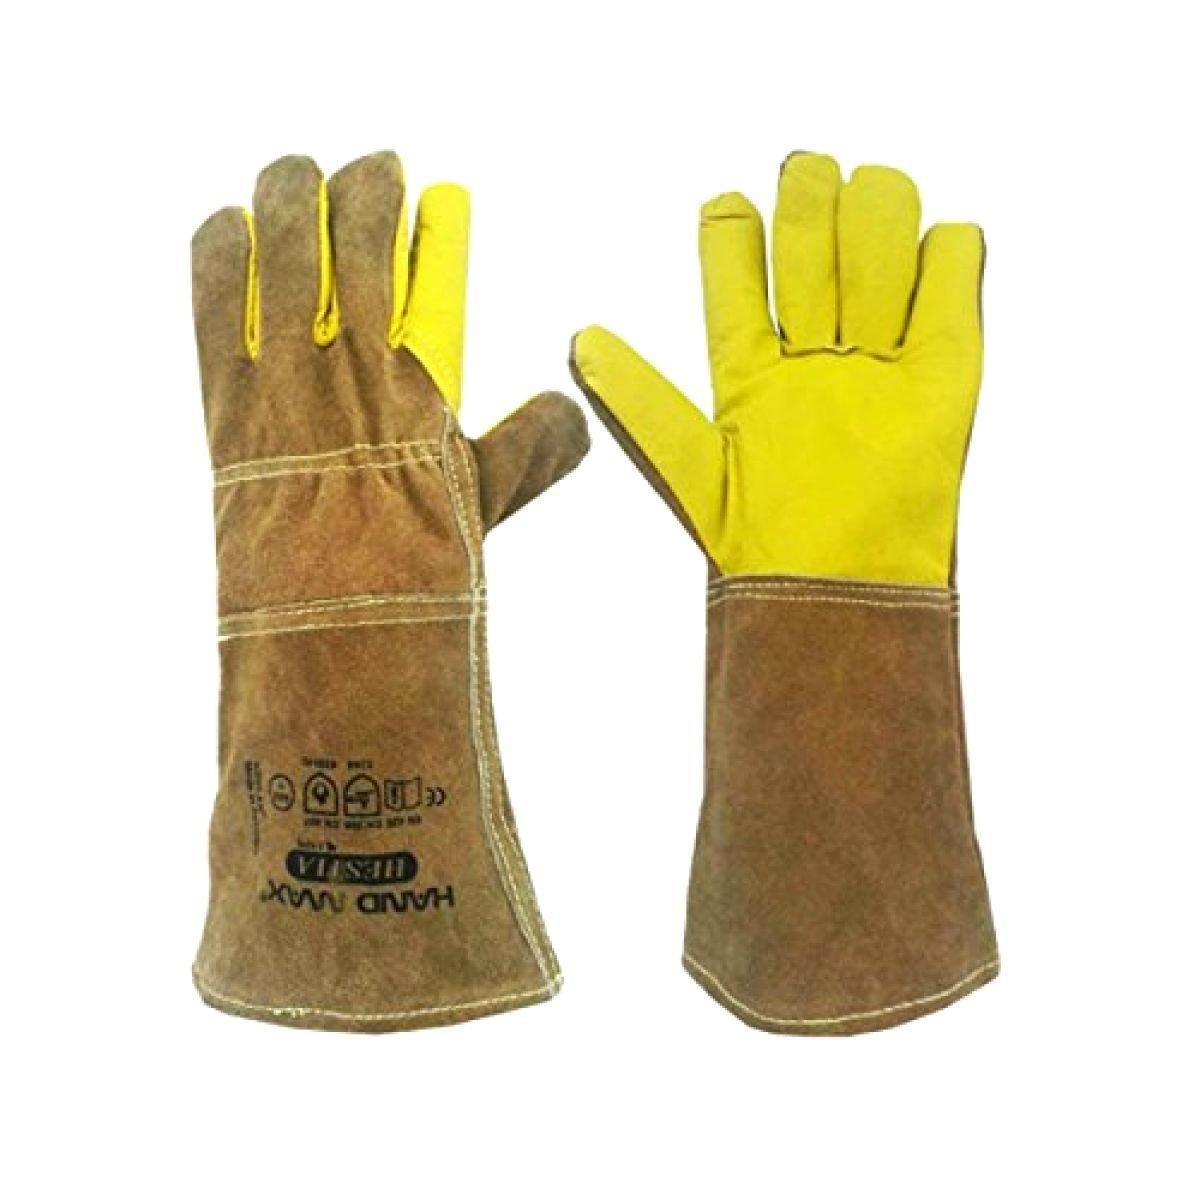 Animal Handling Gloves 35cm GAUNTLET LEATHER Kevlar DOG CAT BIRD REPTILE